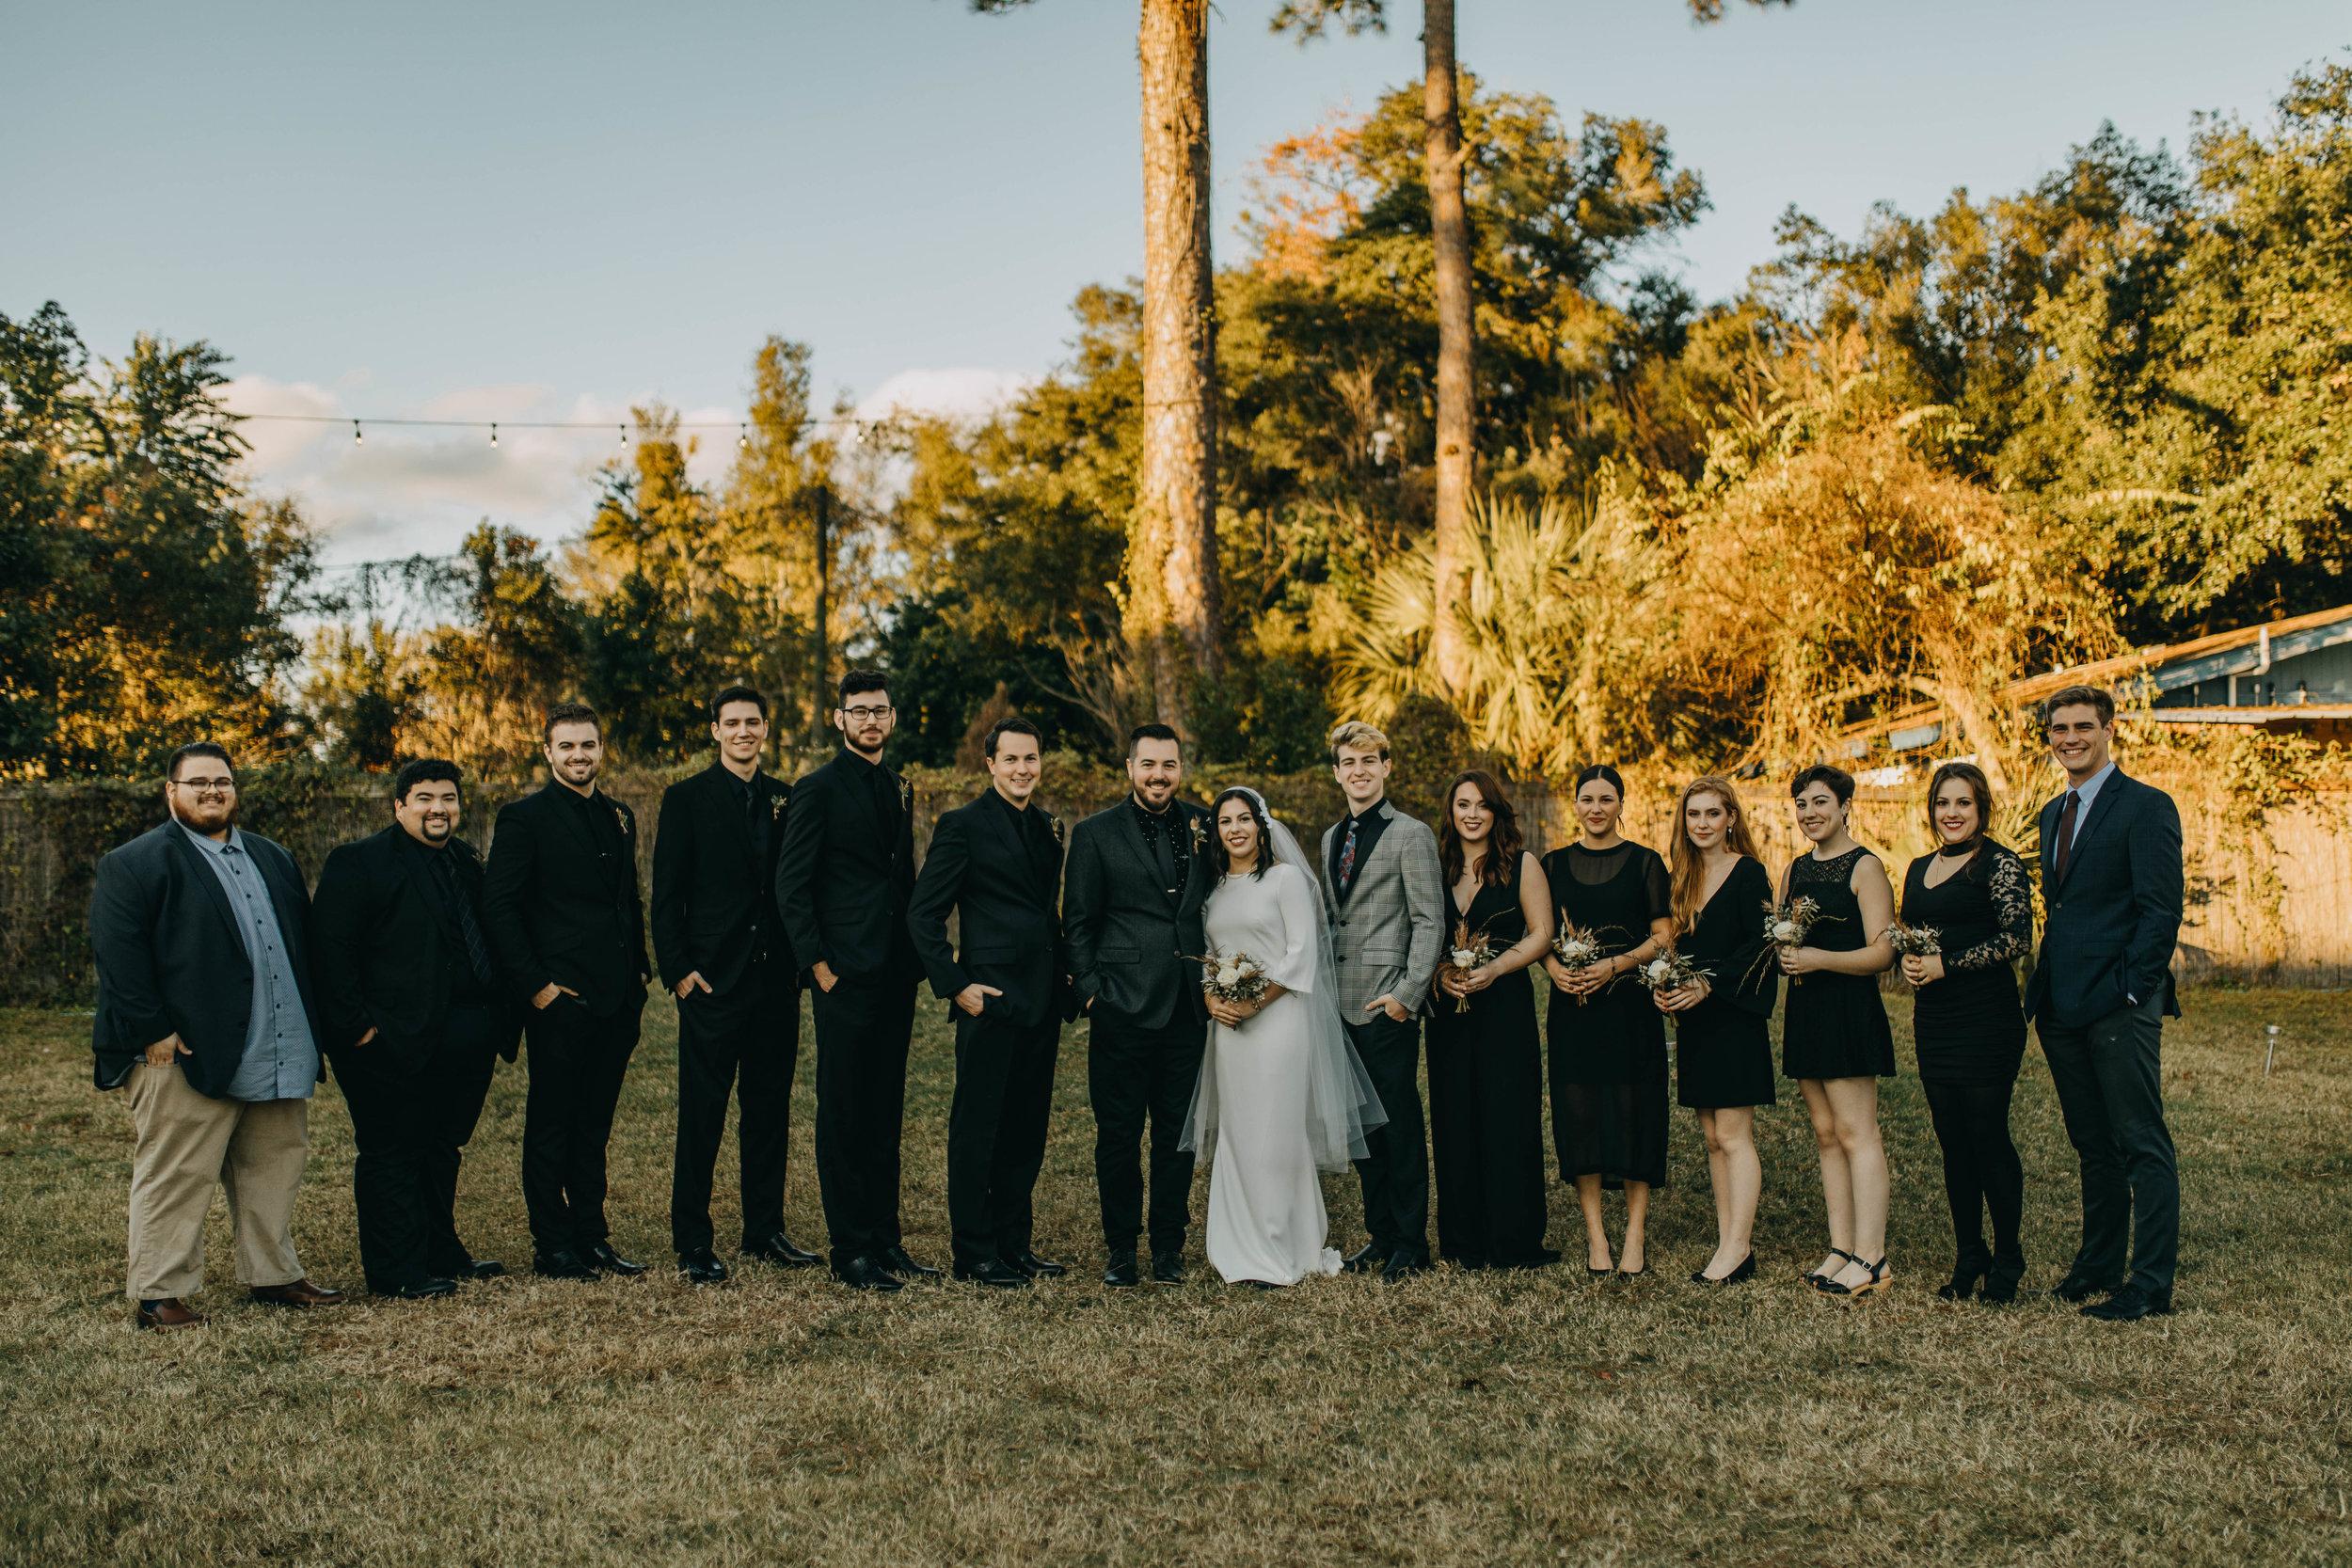 Bridal Party Photos | American Traditional Tattoo Themed Eco Friendly Dark Florida Wedding